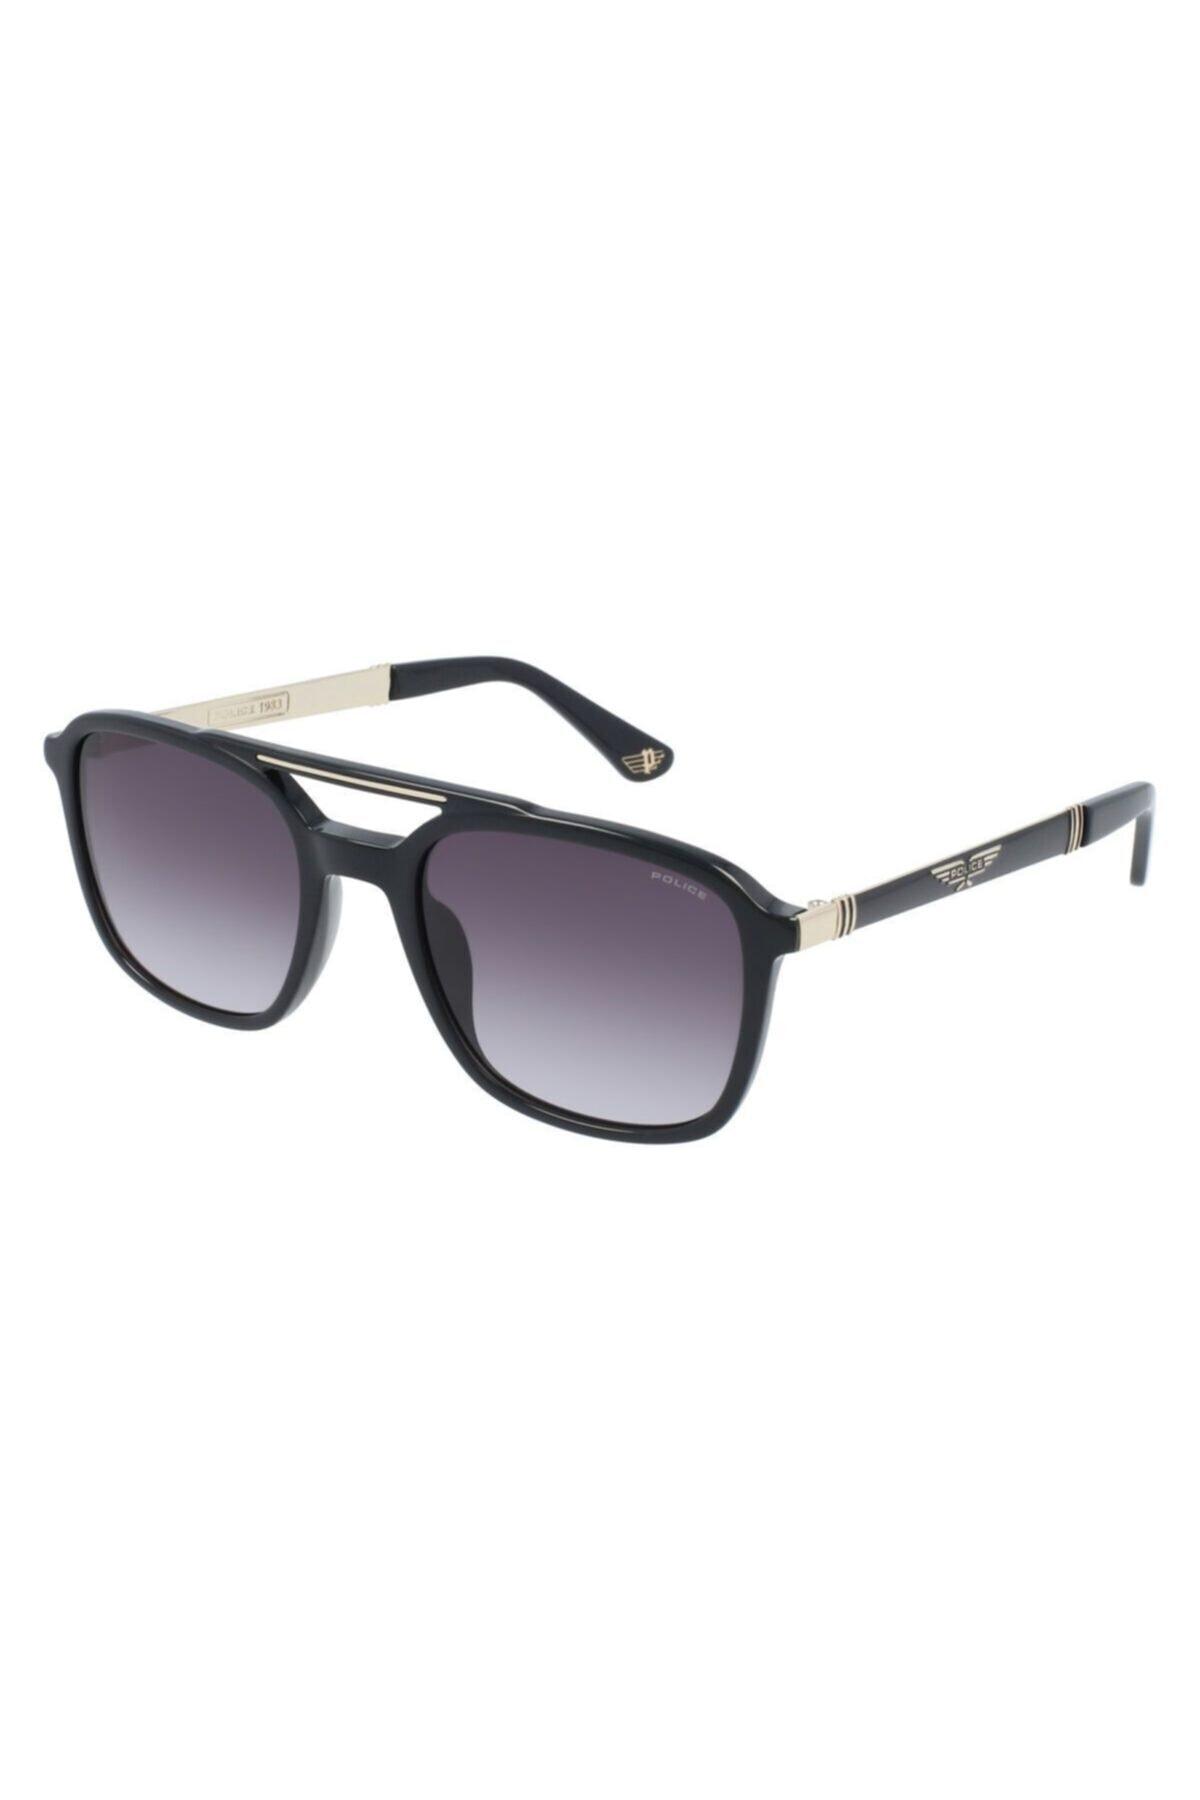 عینک آفتابی زنانه فروش برند Police رنگ مشکی کد ty101163975